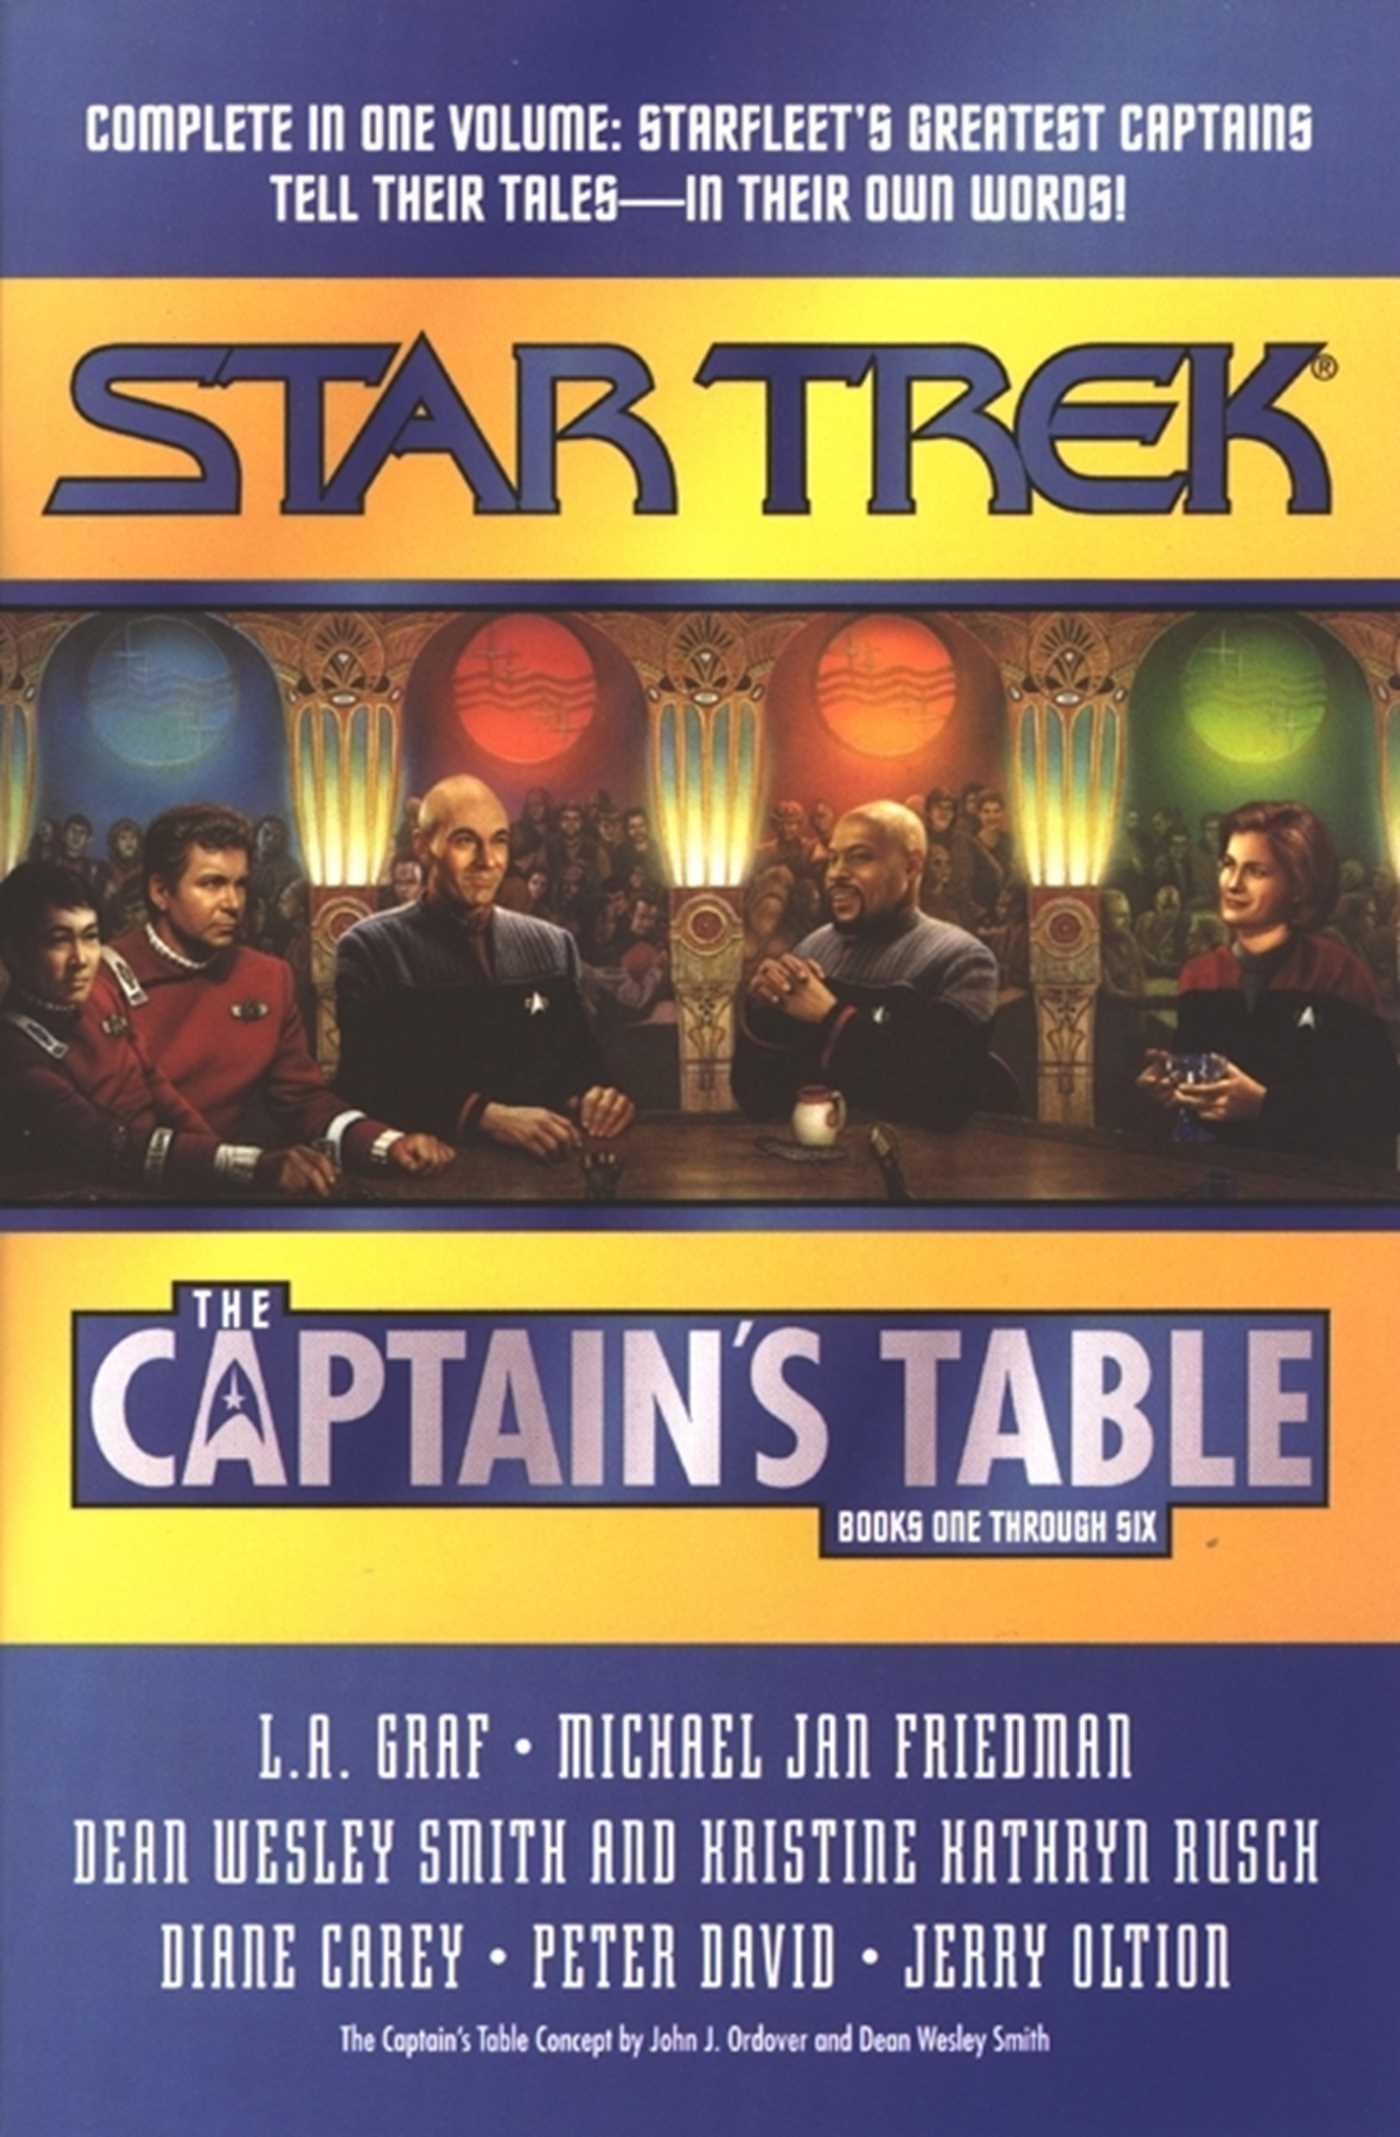 The captains table 9780743406703 hr